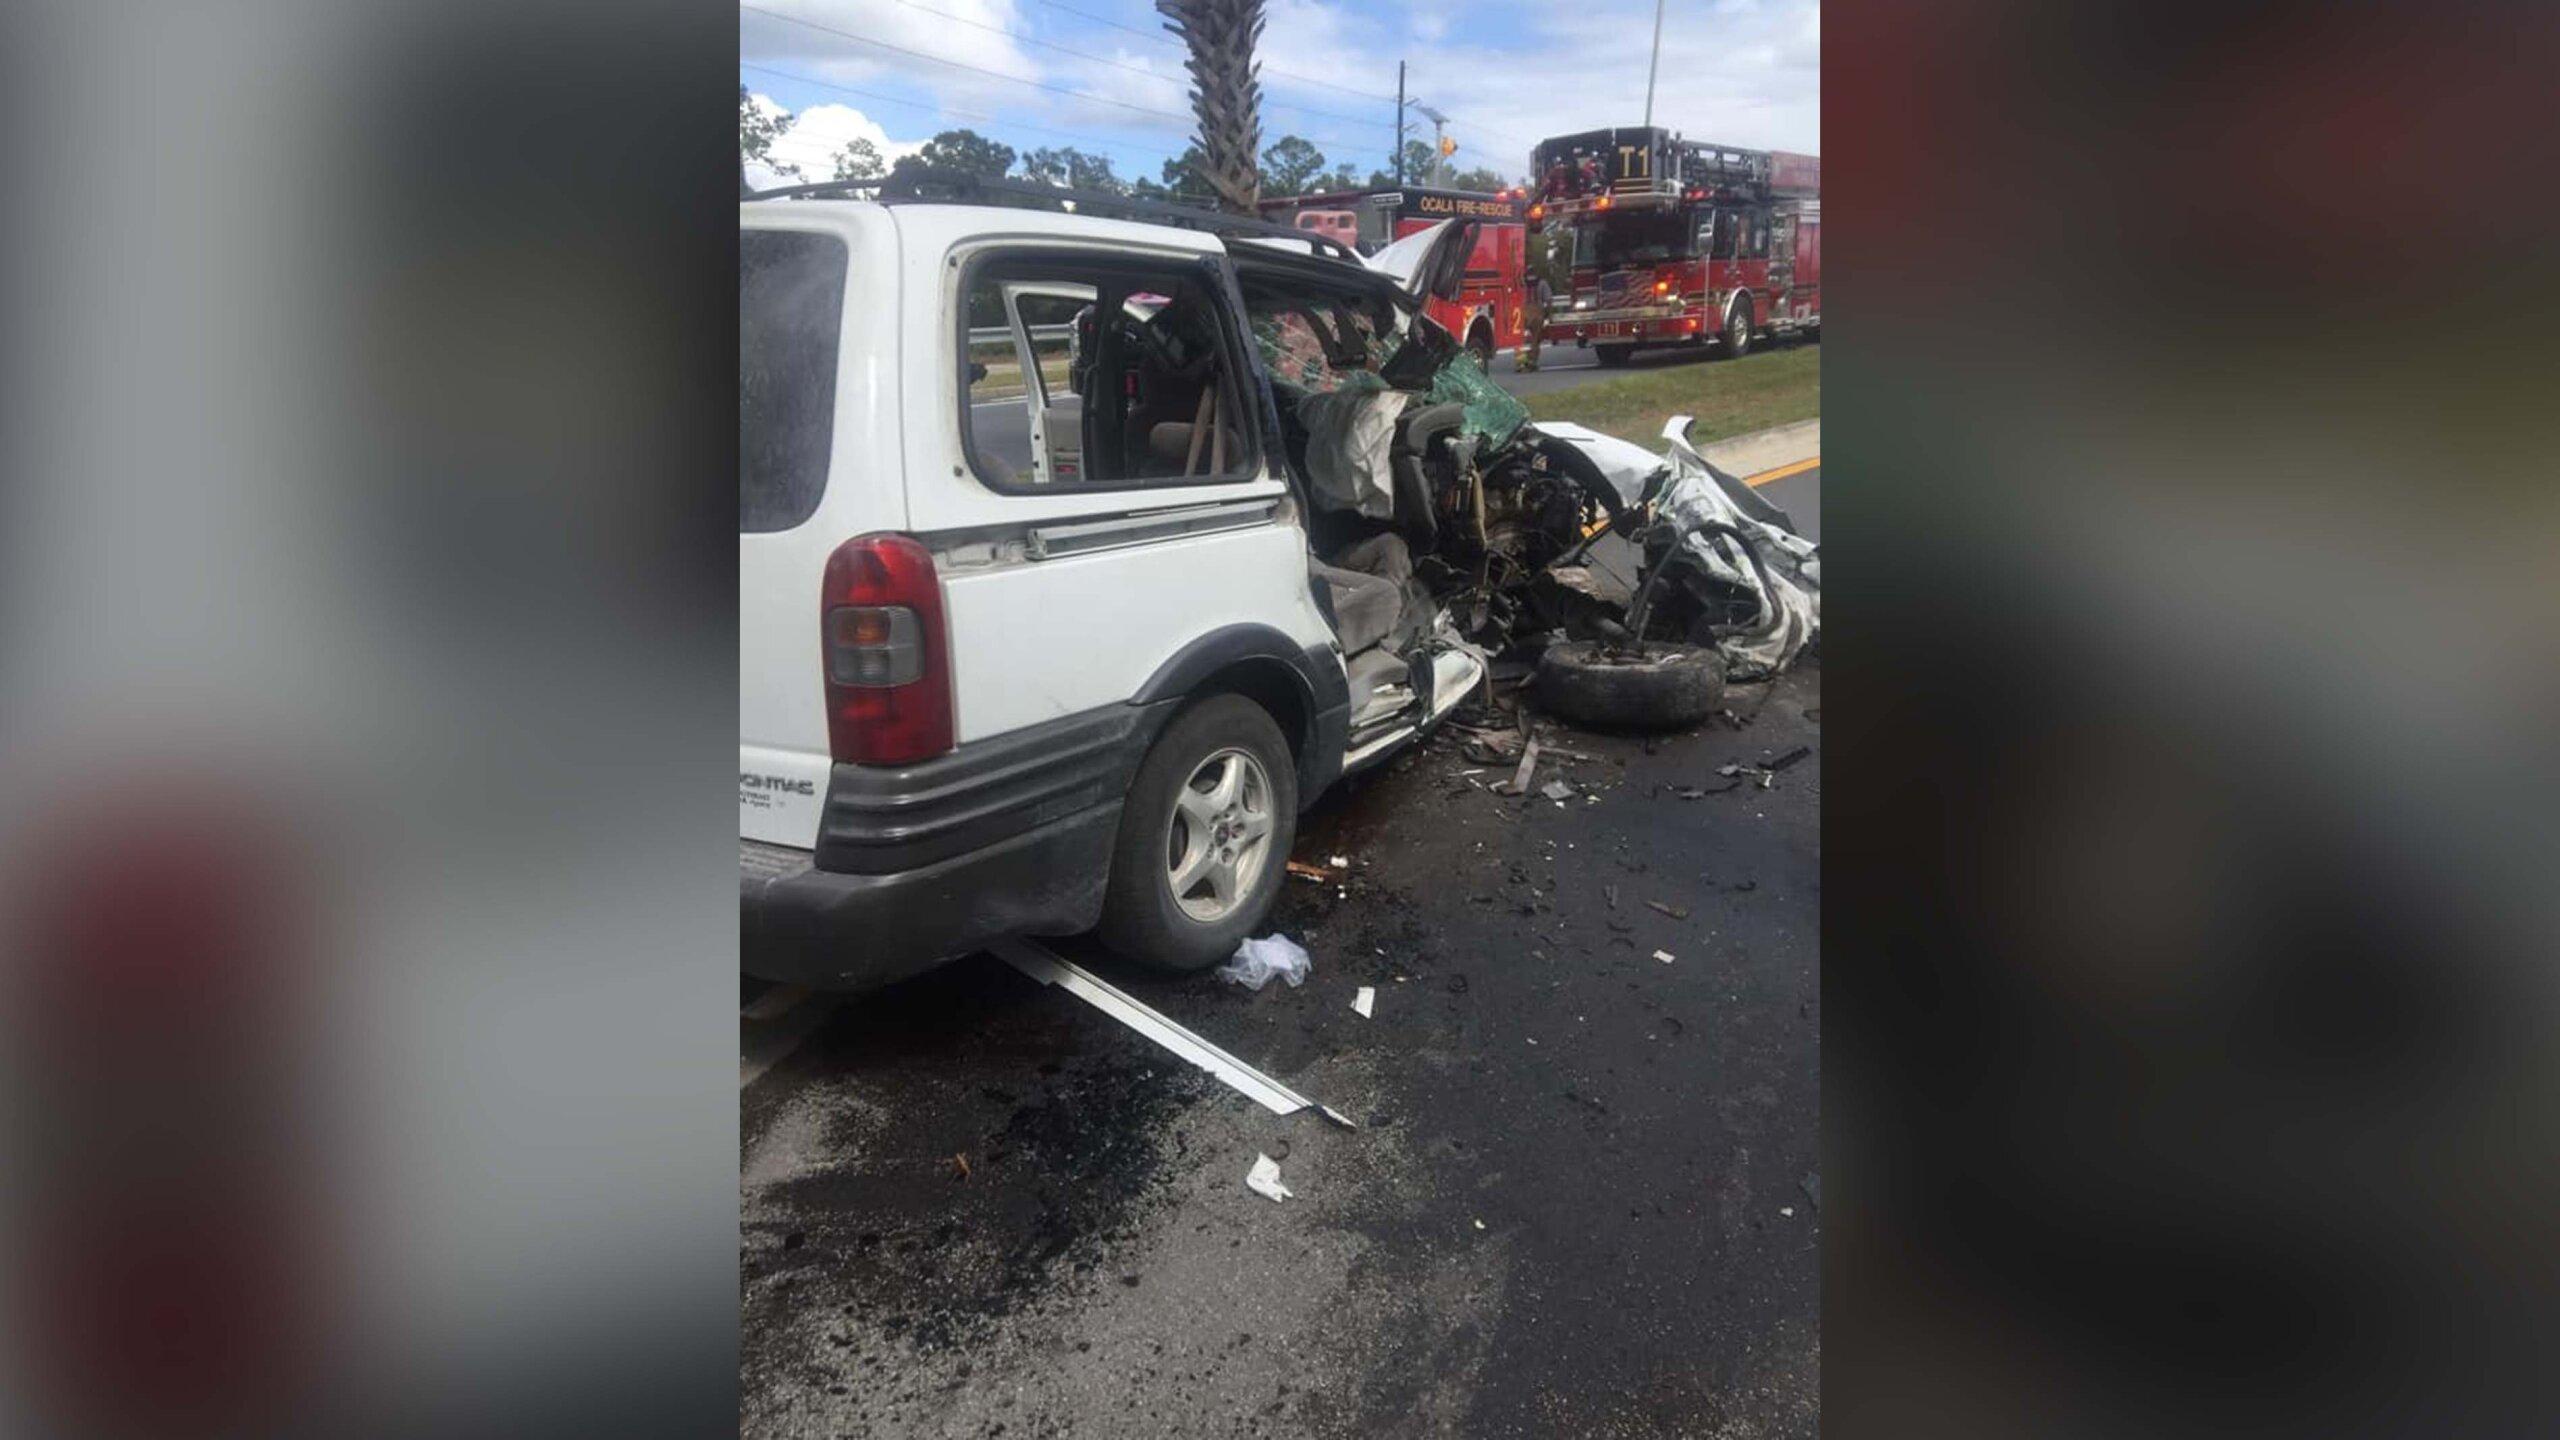 Photos: Police say mother tells children to take off seat belts before purposefully crashingvan